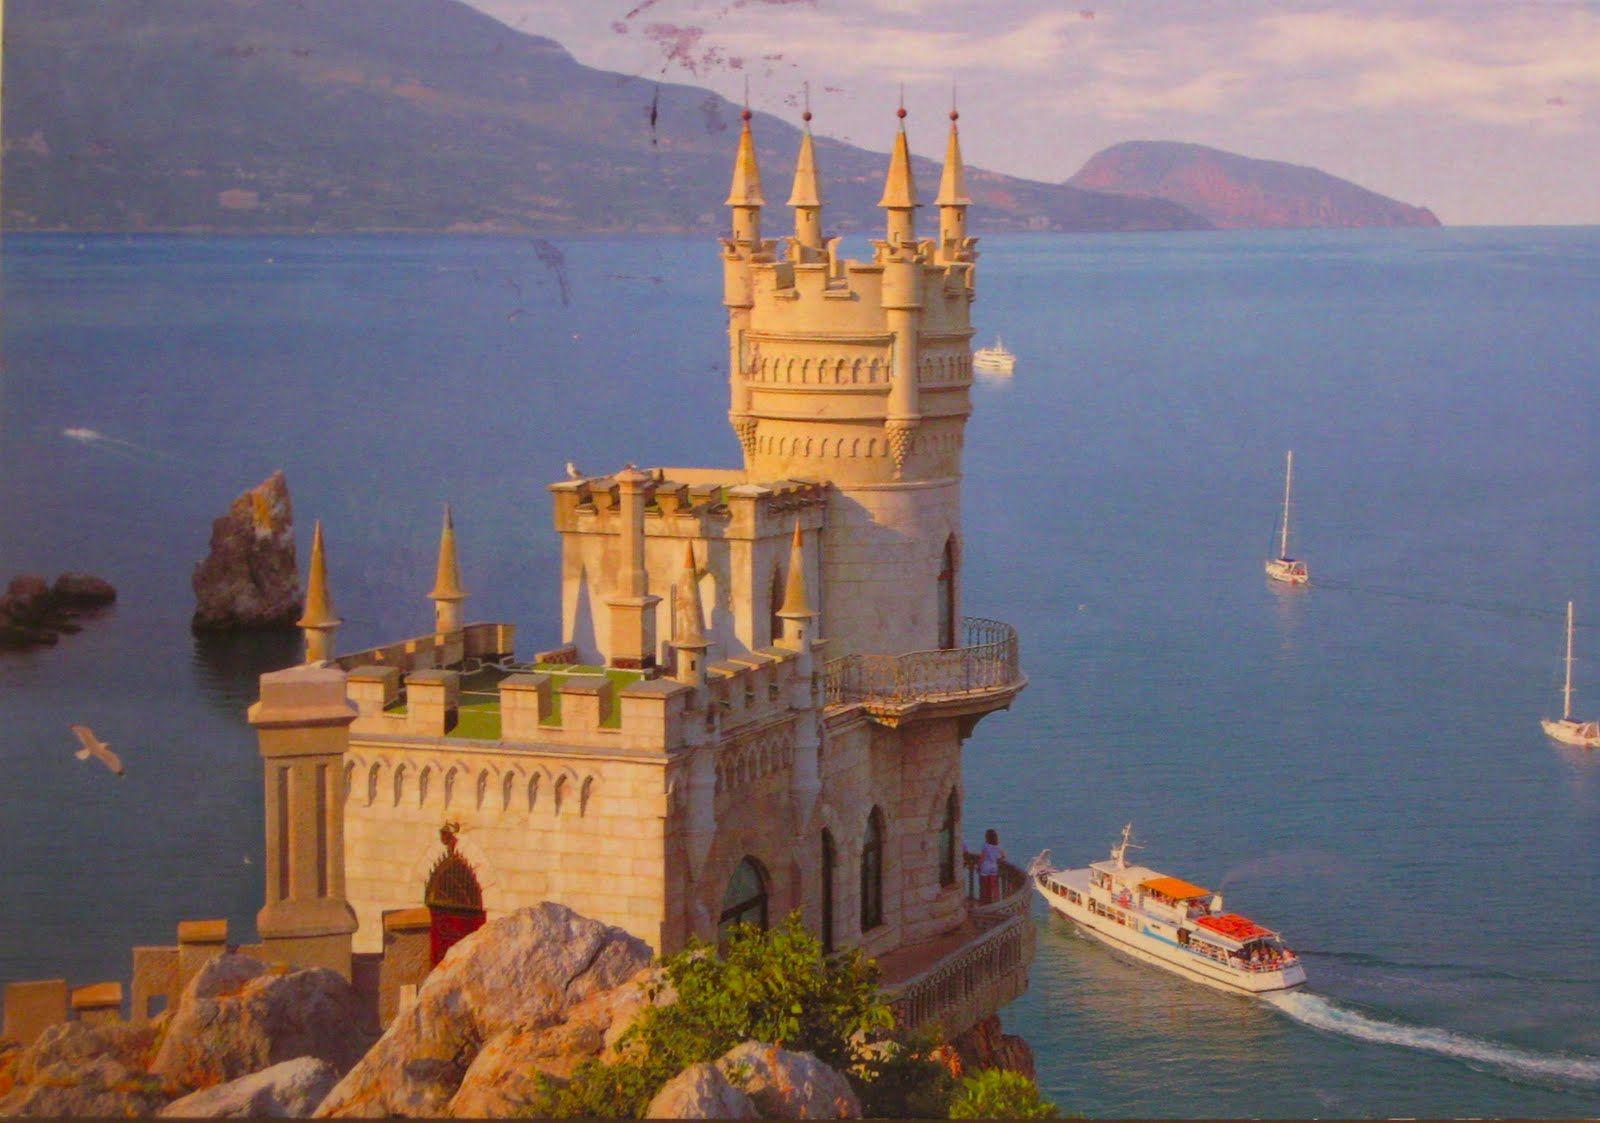 Swallows Nest Castle Crimeas Fairytale Castle on a Cliff